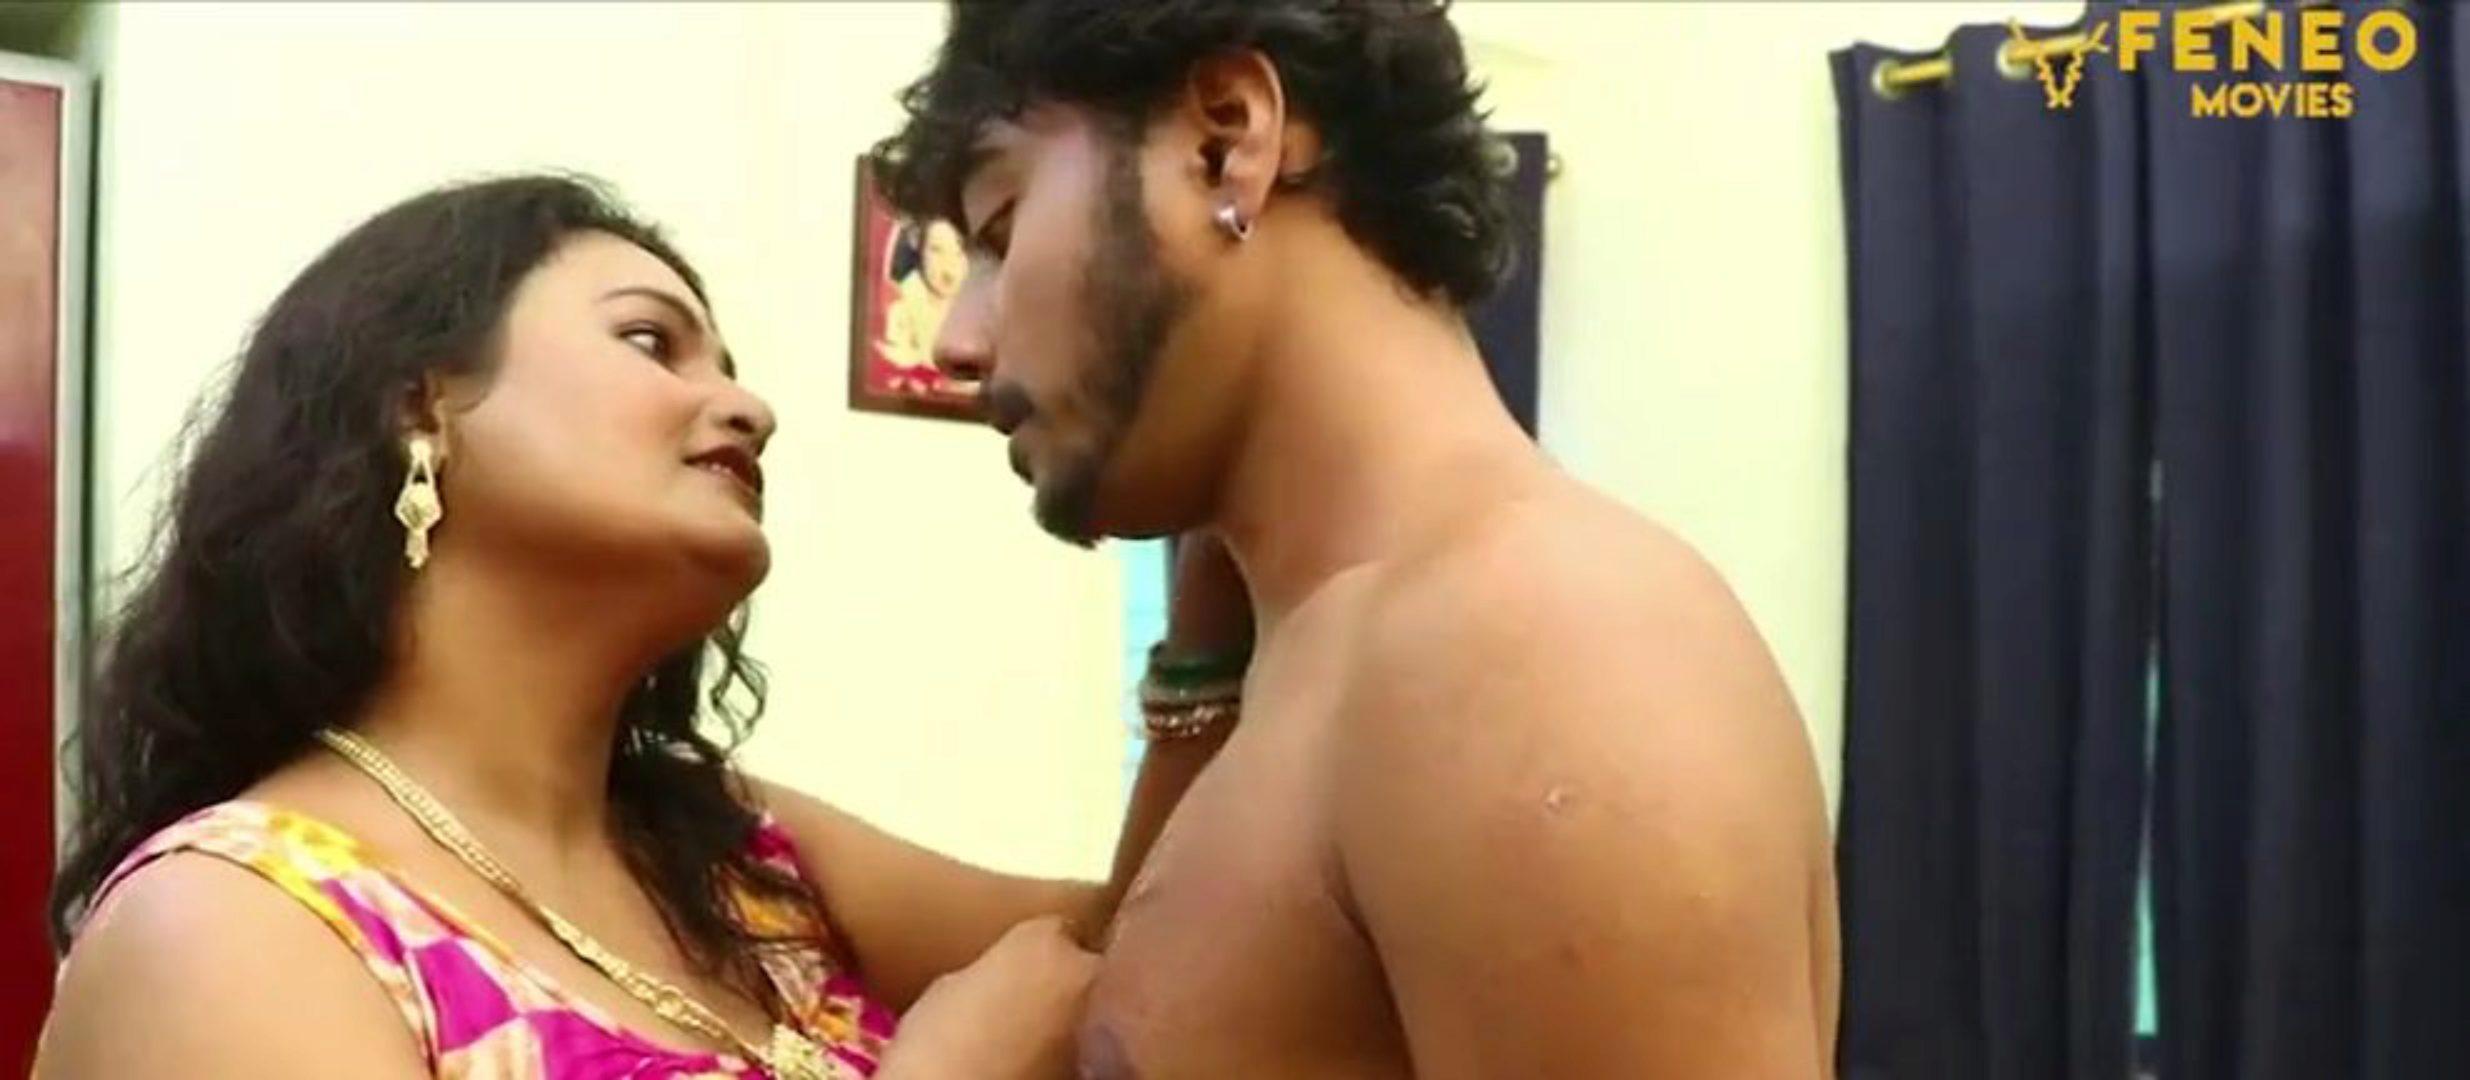 Fuck young india big boobs Big Boob Indian Aunty Nude Clap